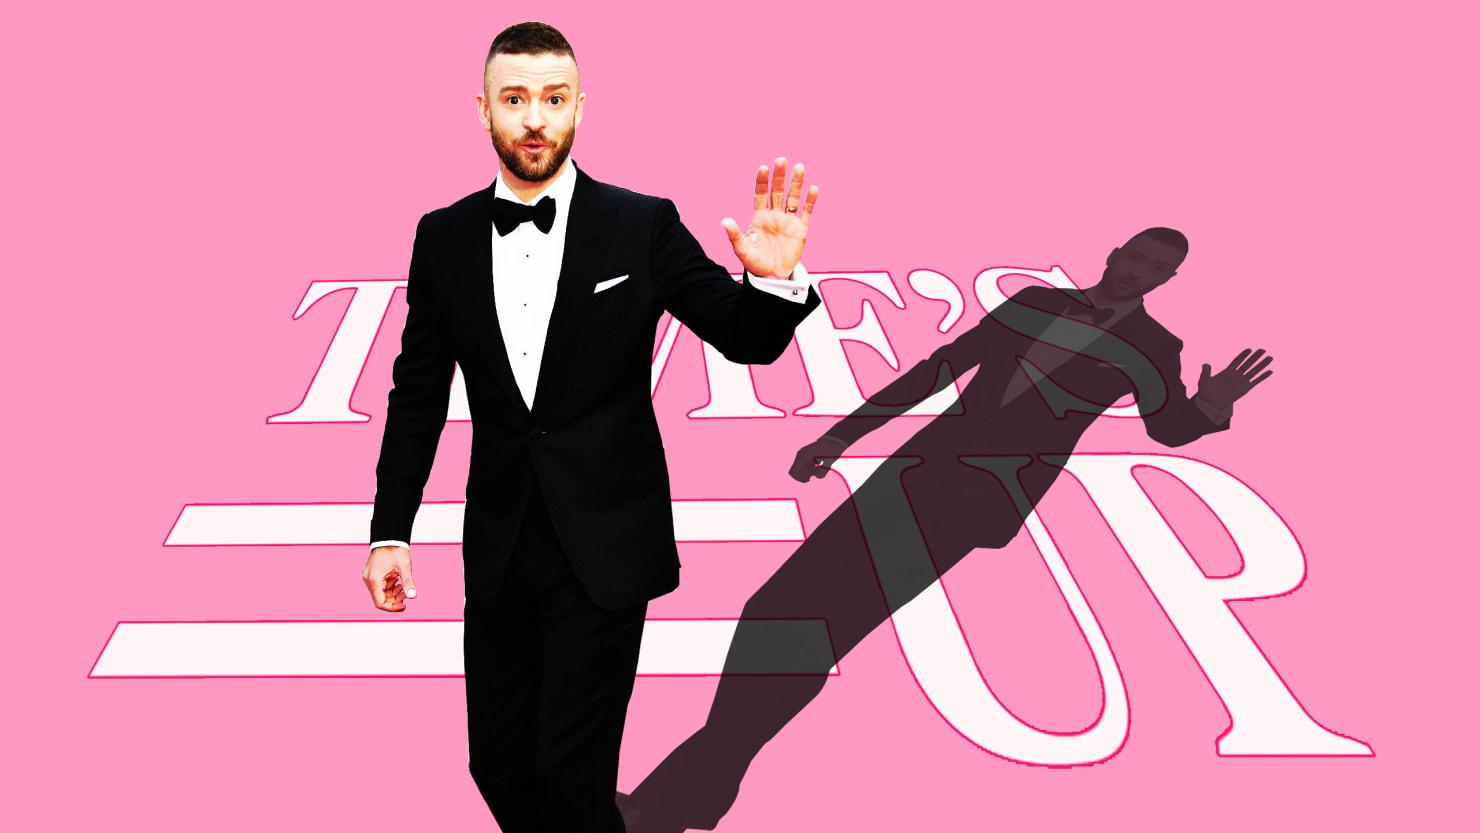 Justin Timberlake's Glaring Time's Up Hypocrisy